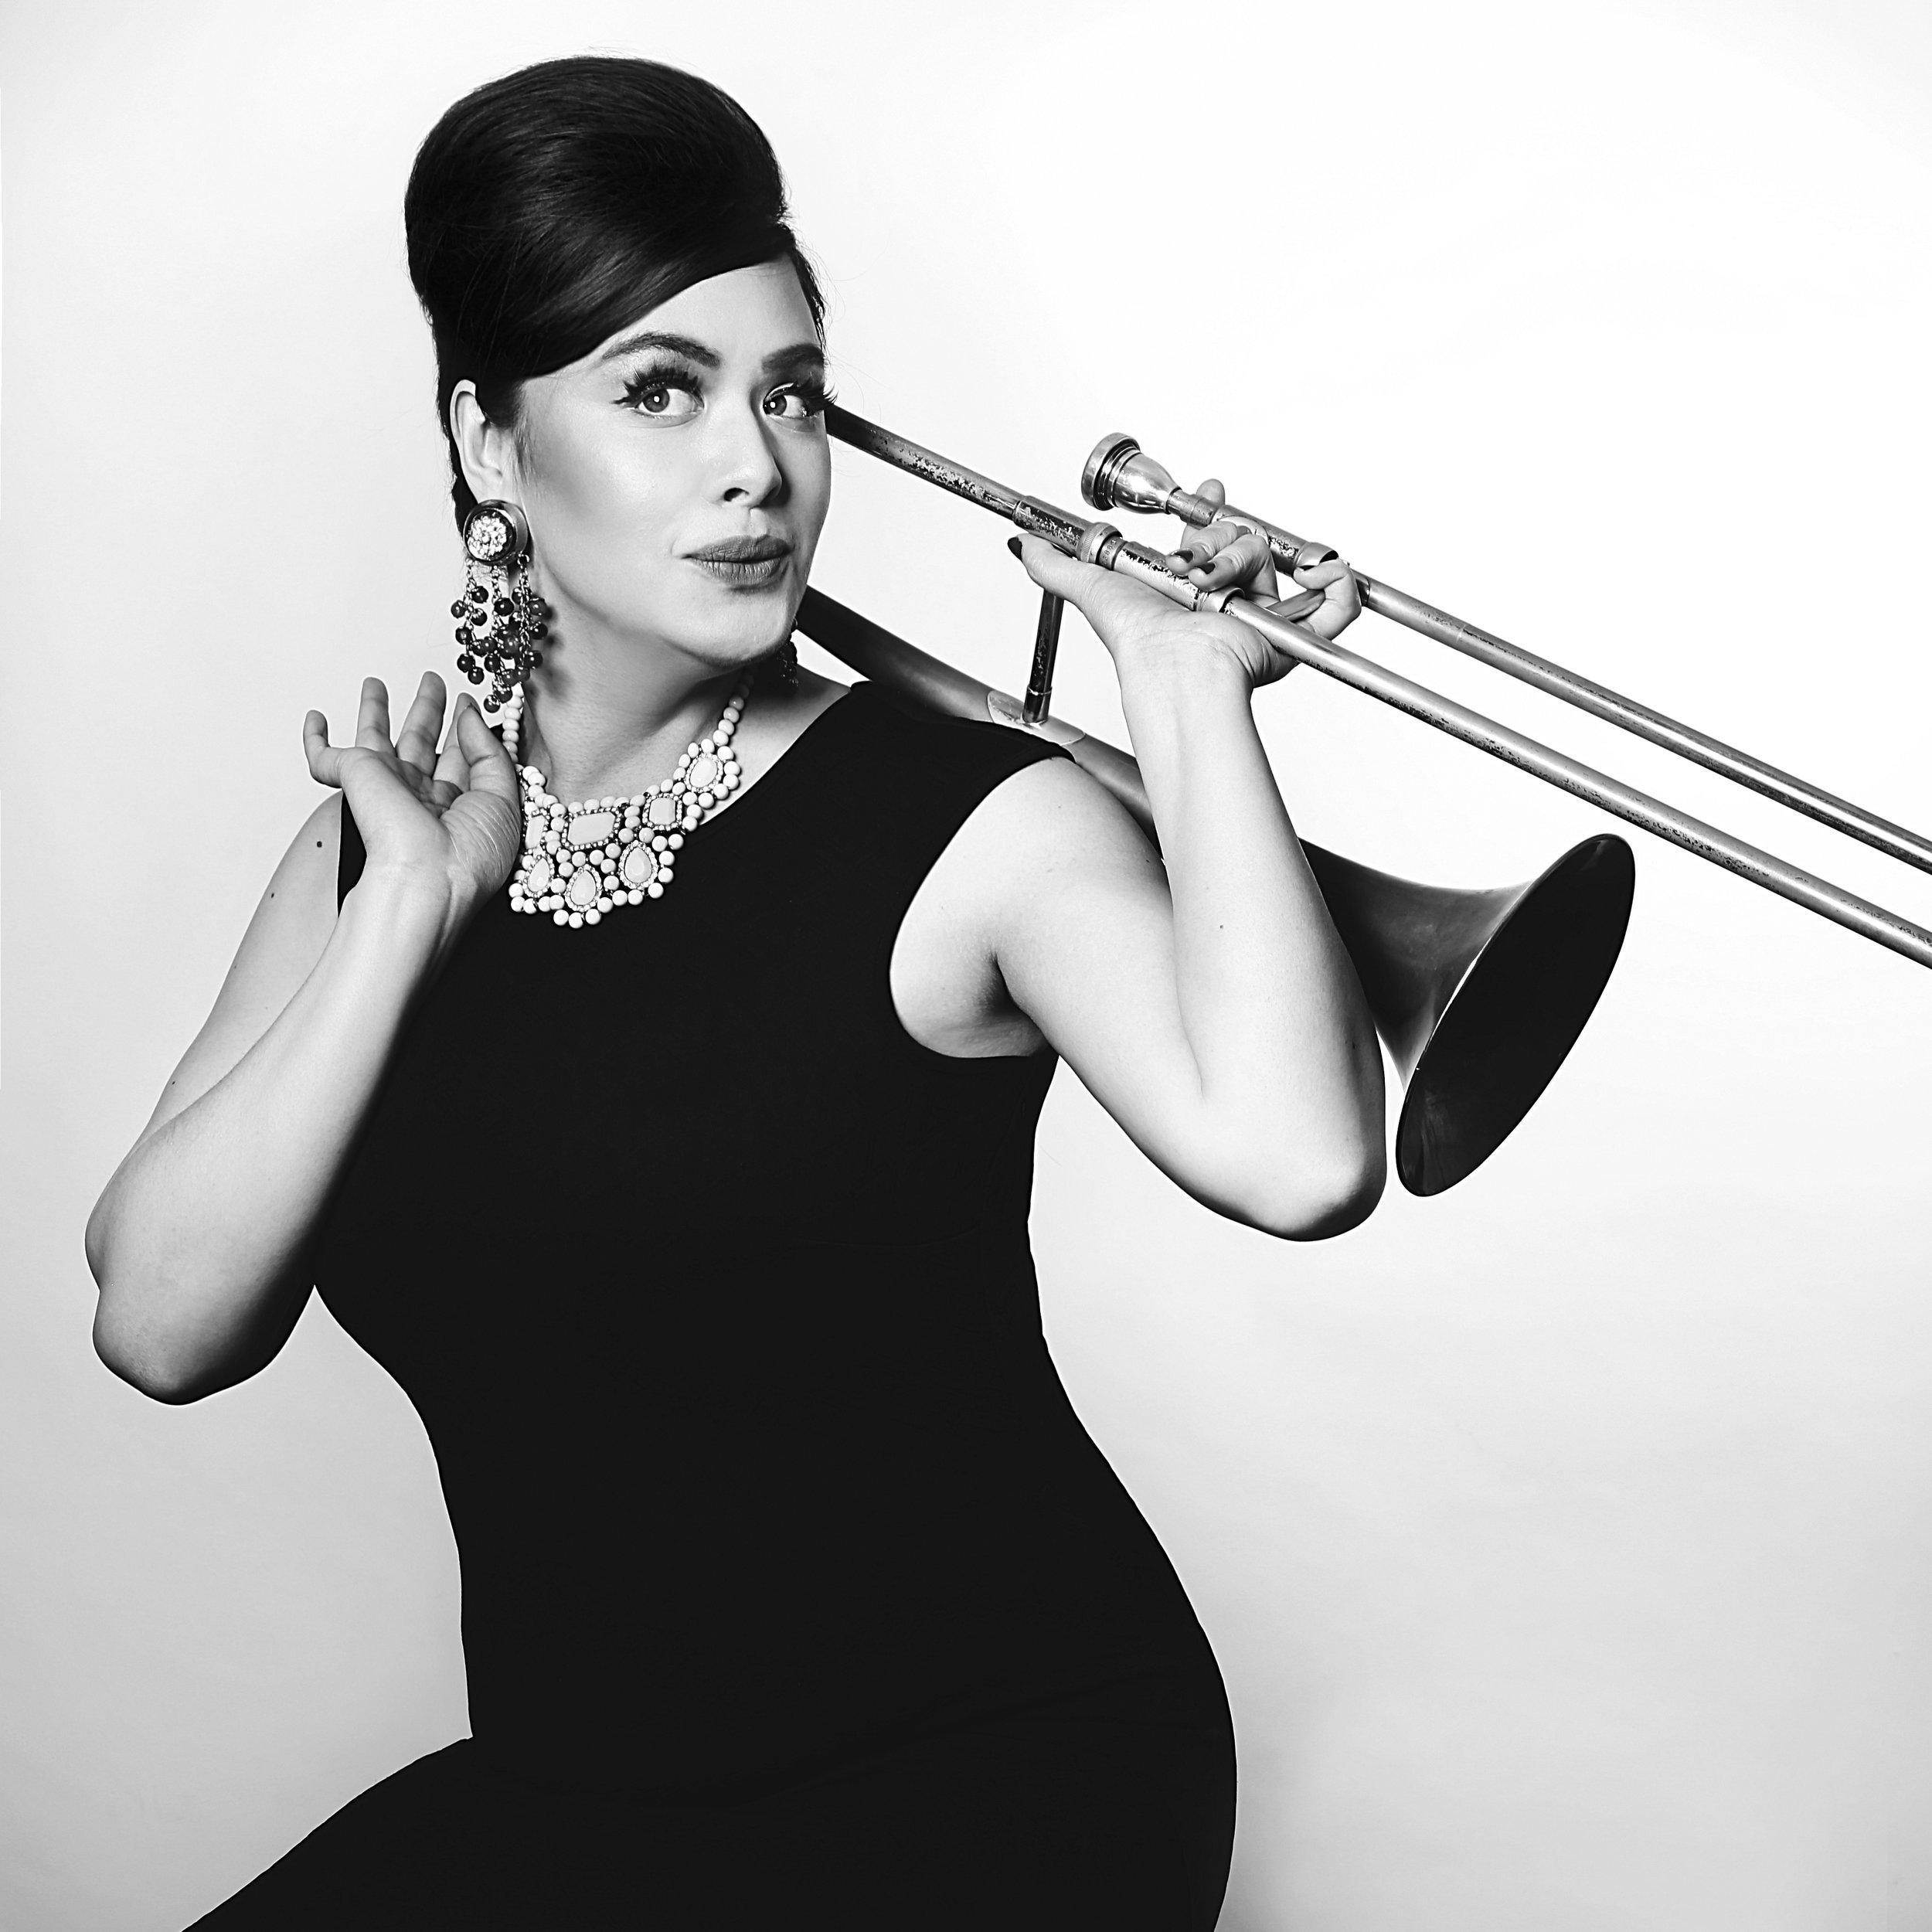 Audrey Ochoa 1 by Uryelle Dimailig.jpg